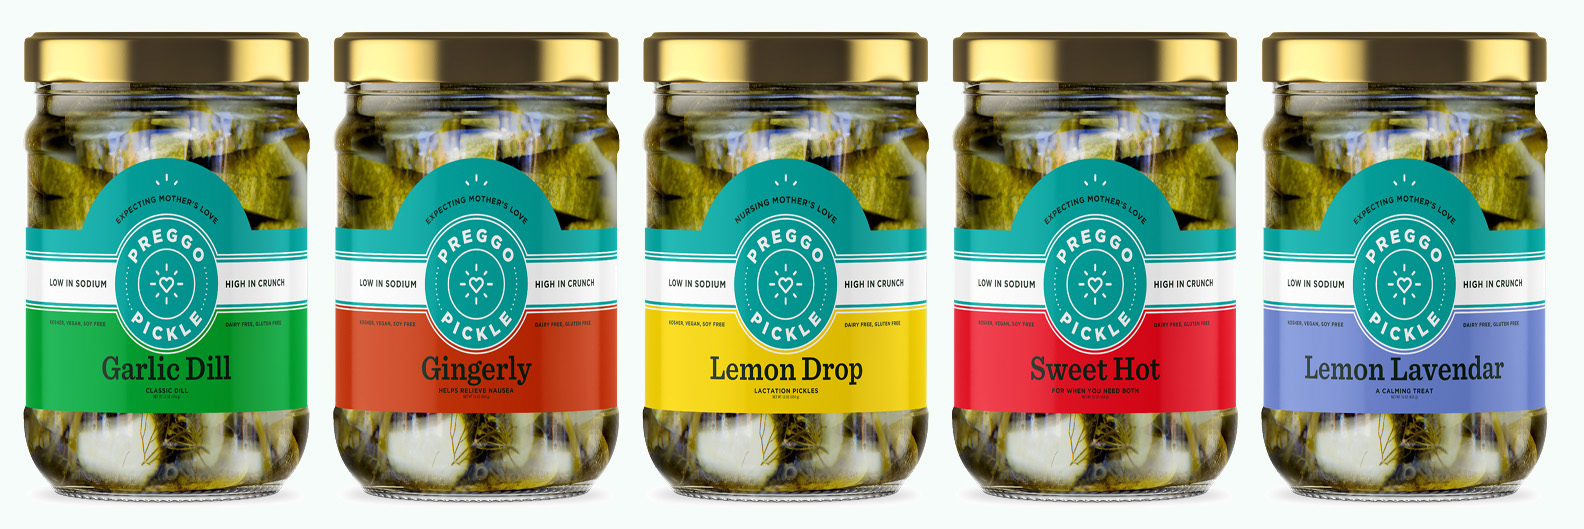 Preggo Pickle Mix and Match 5 Pack